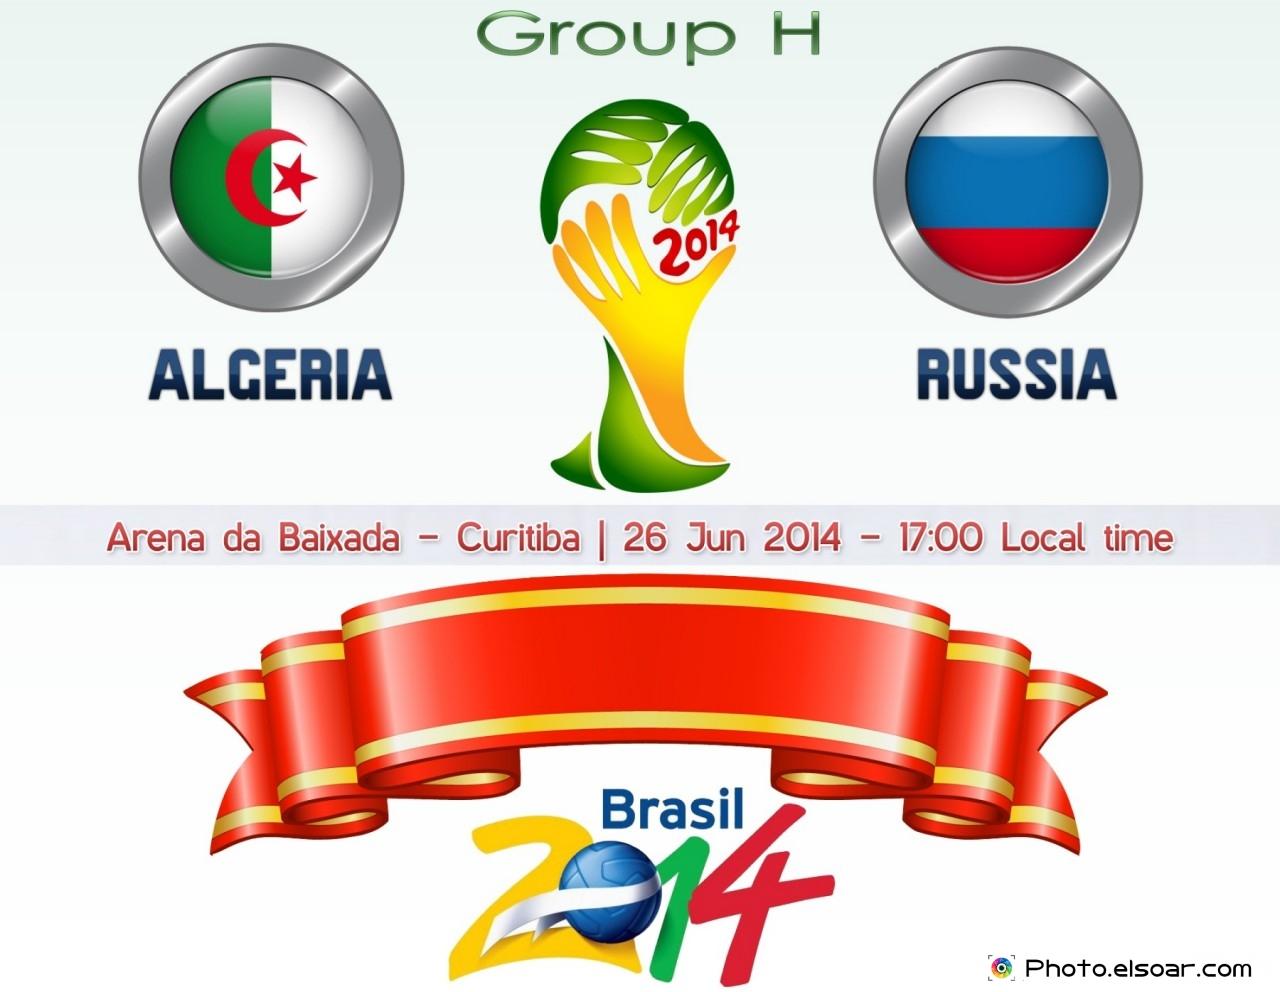 Algeria Vs Russia - World Cup 2014 - 26 Jun 2014 - 17:00 Local time - GROUP H - Arena da Baixada - Curitiba